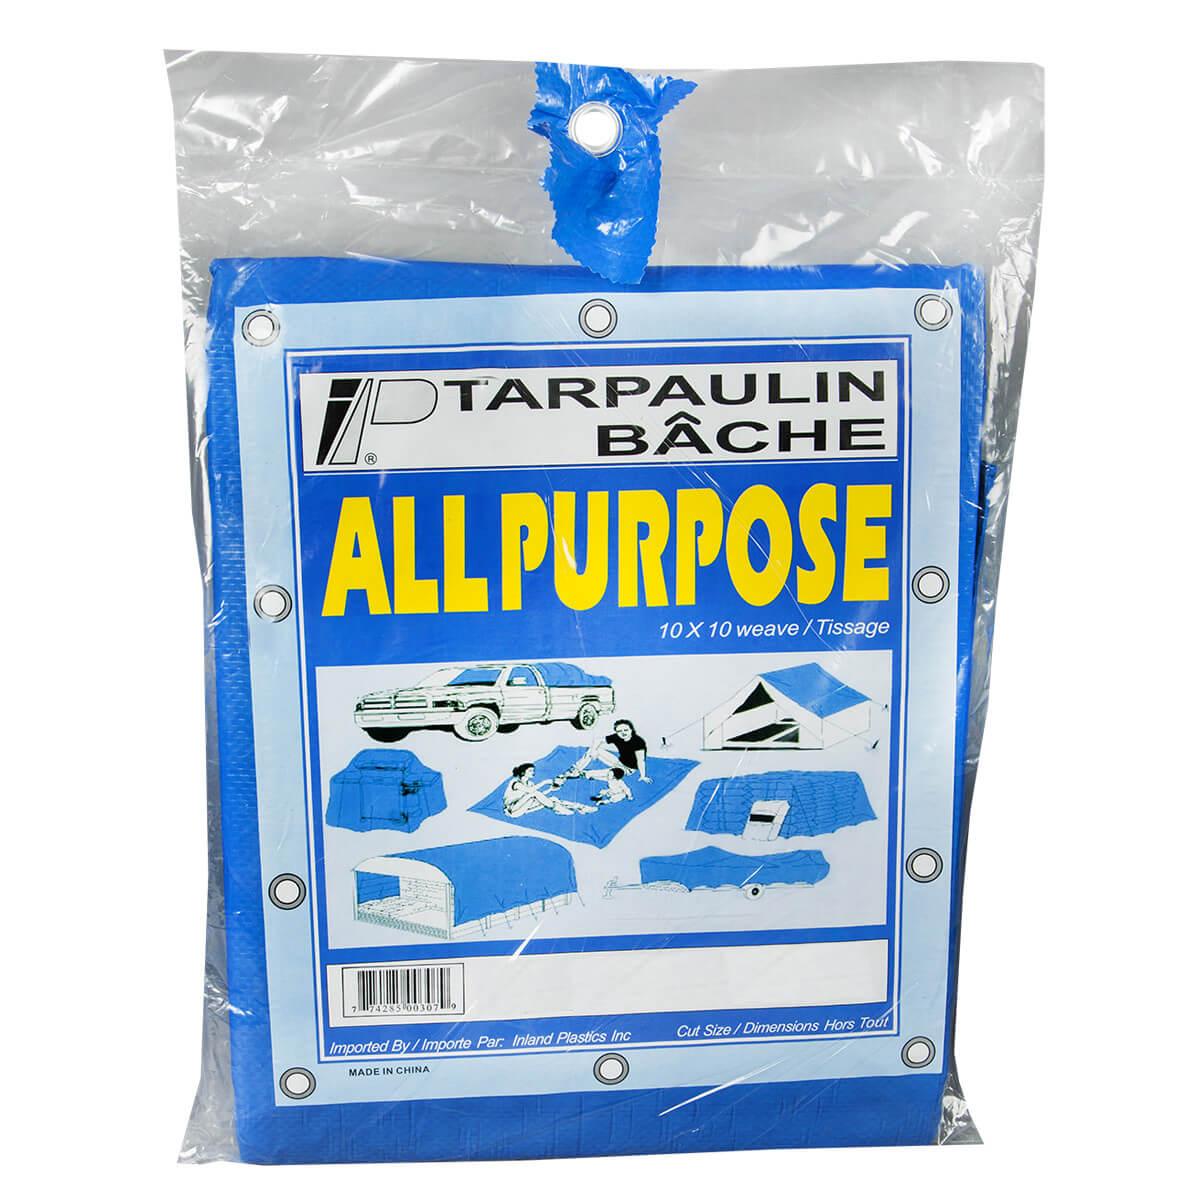 All Purpose Blue Utility Tarps - 20' x 30'